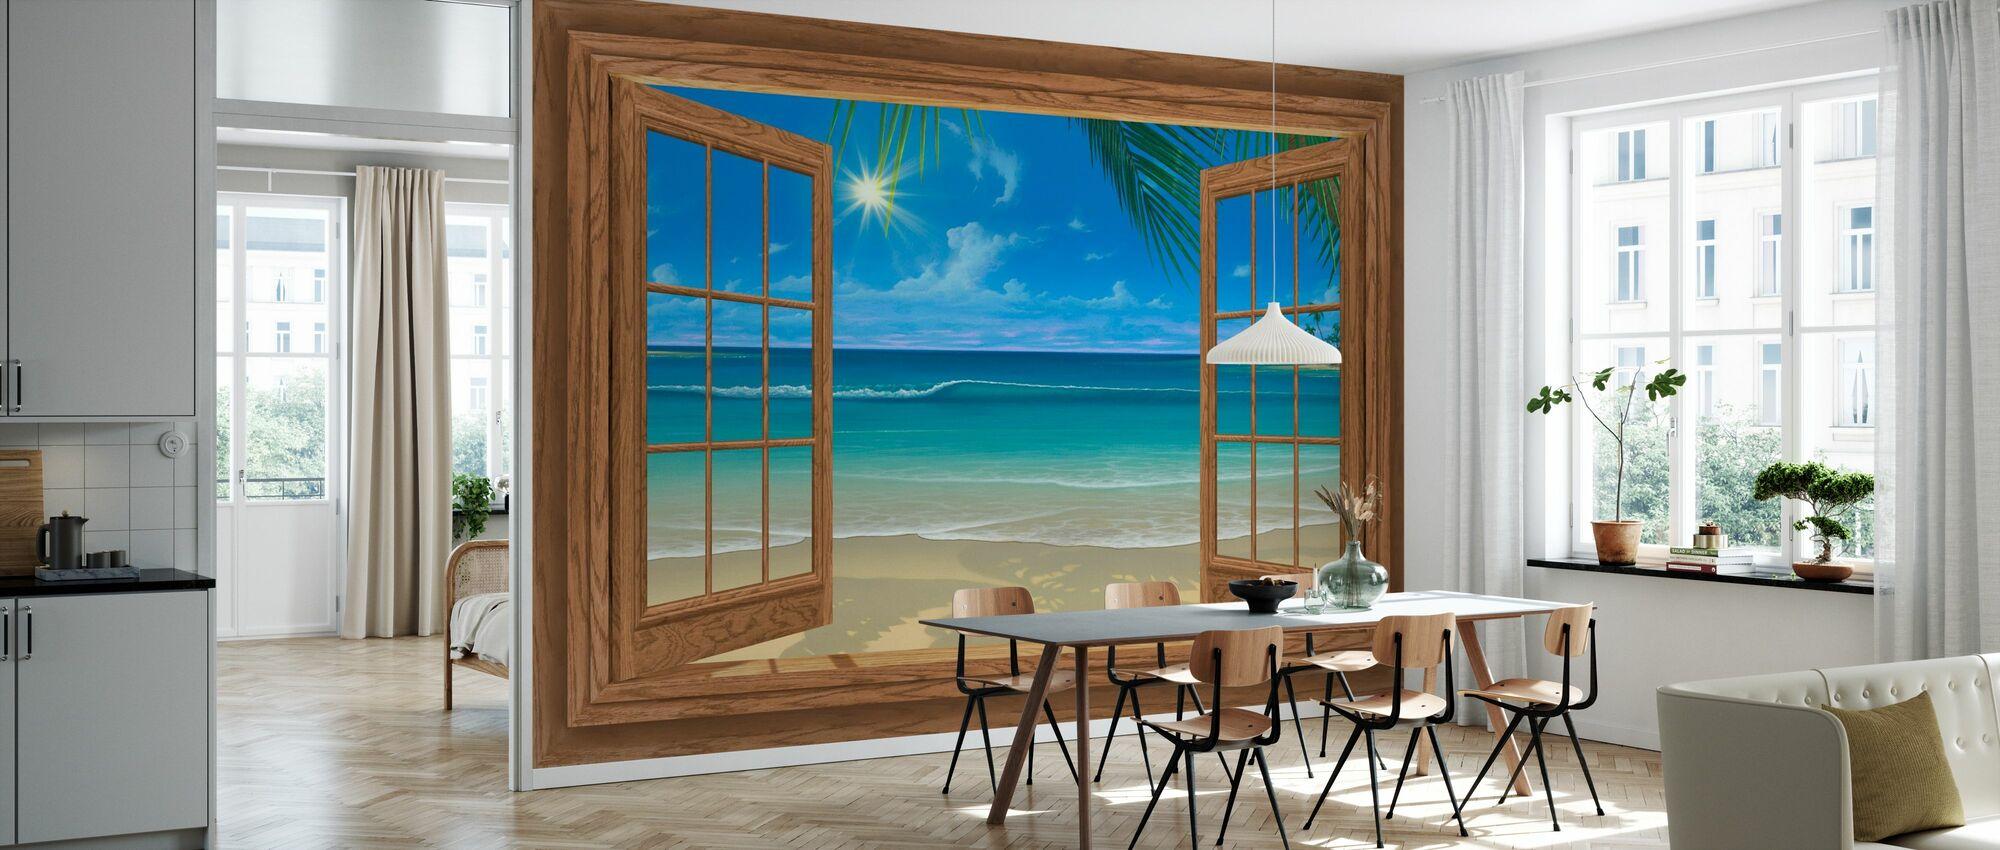 Afternoon View - Wallpaper - Kitchen